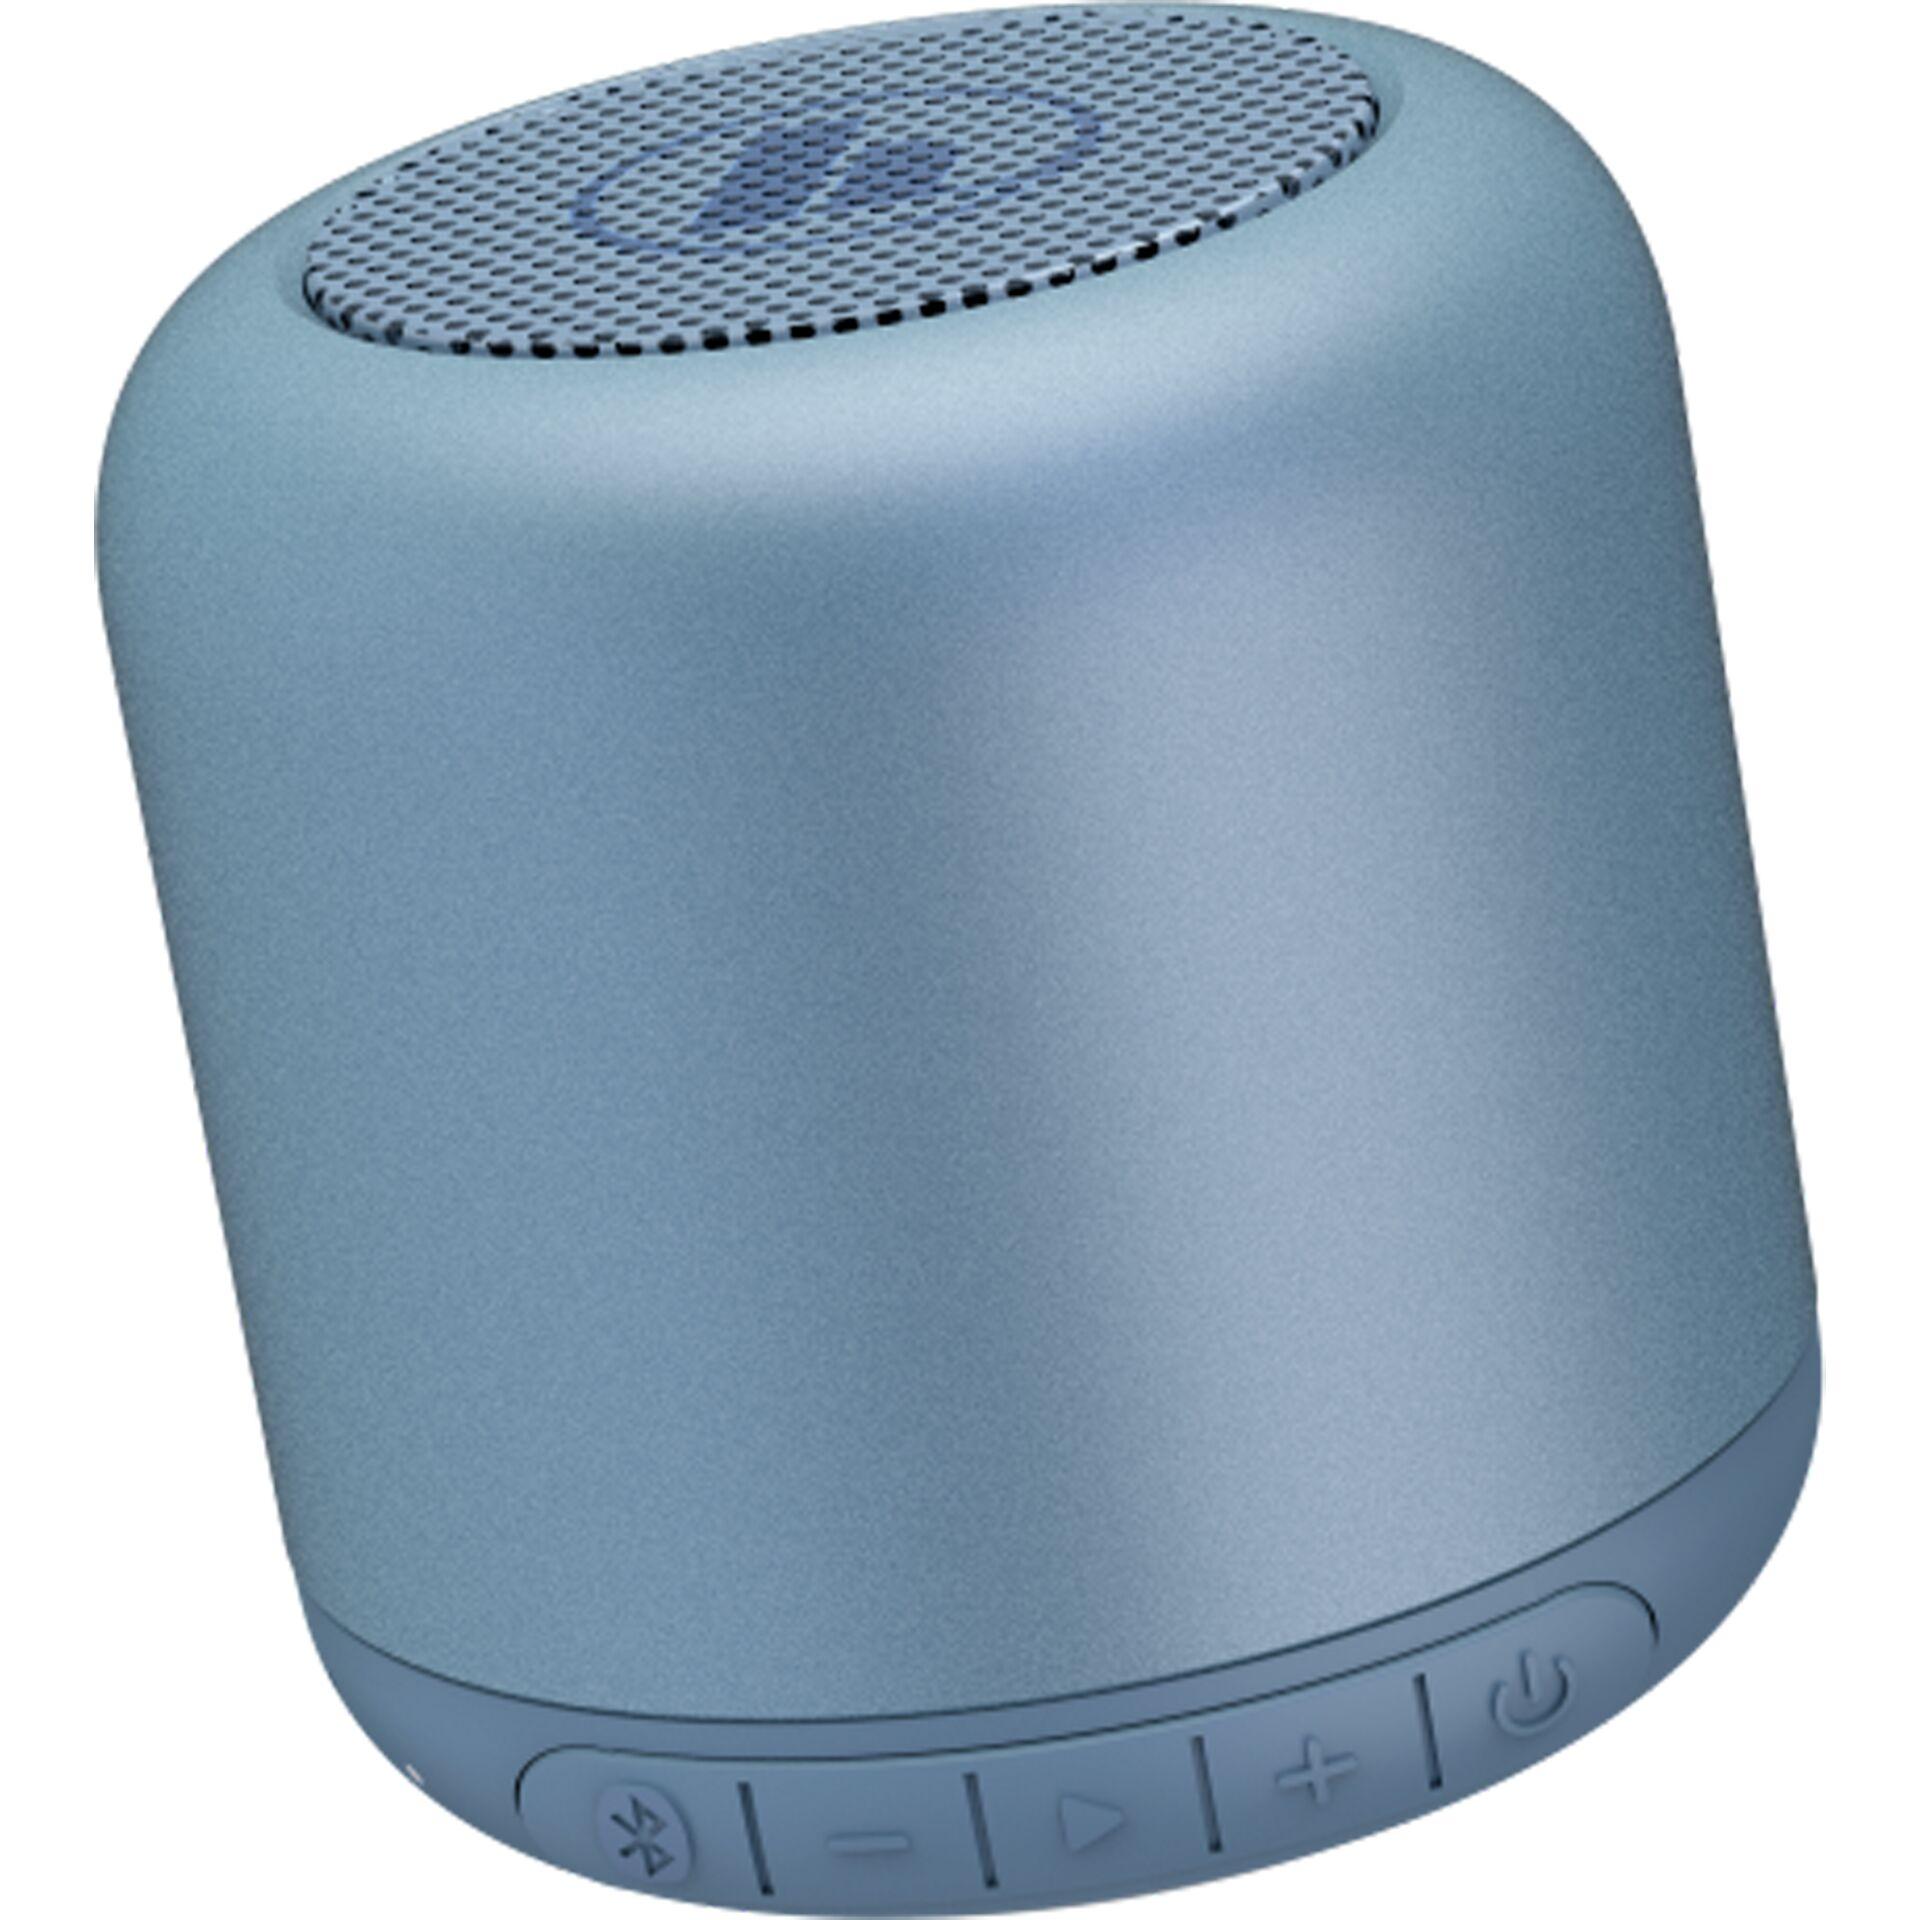 Hama Drum 2.0 Mobile Bluetooth Speakers light blue